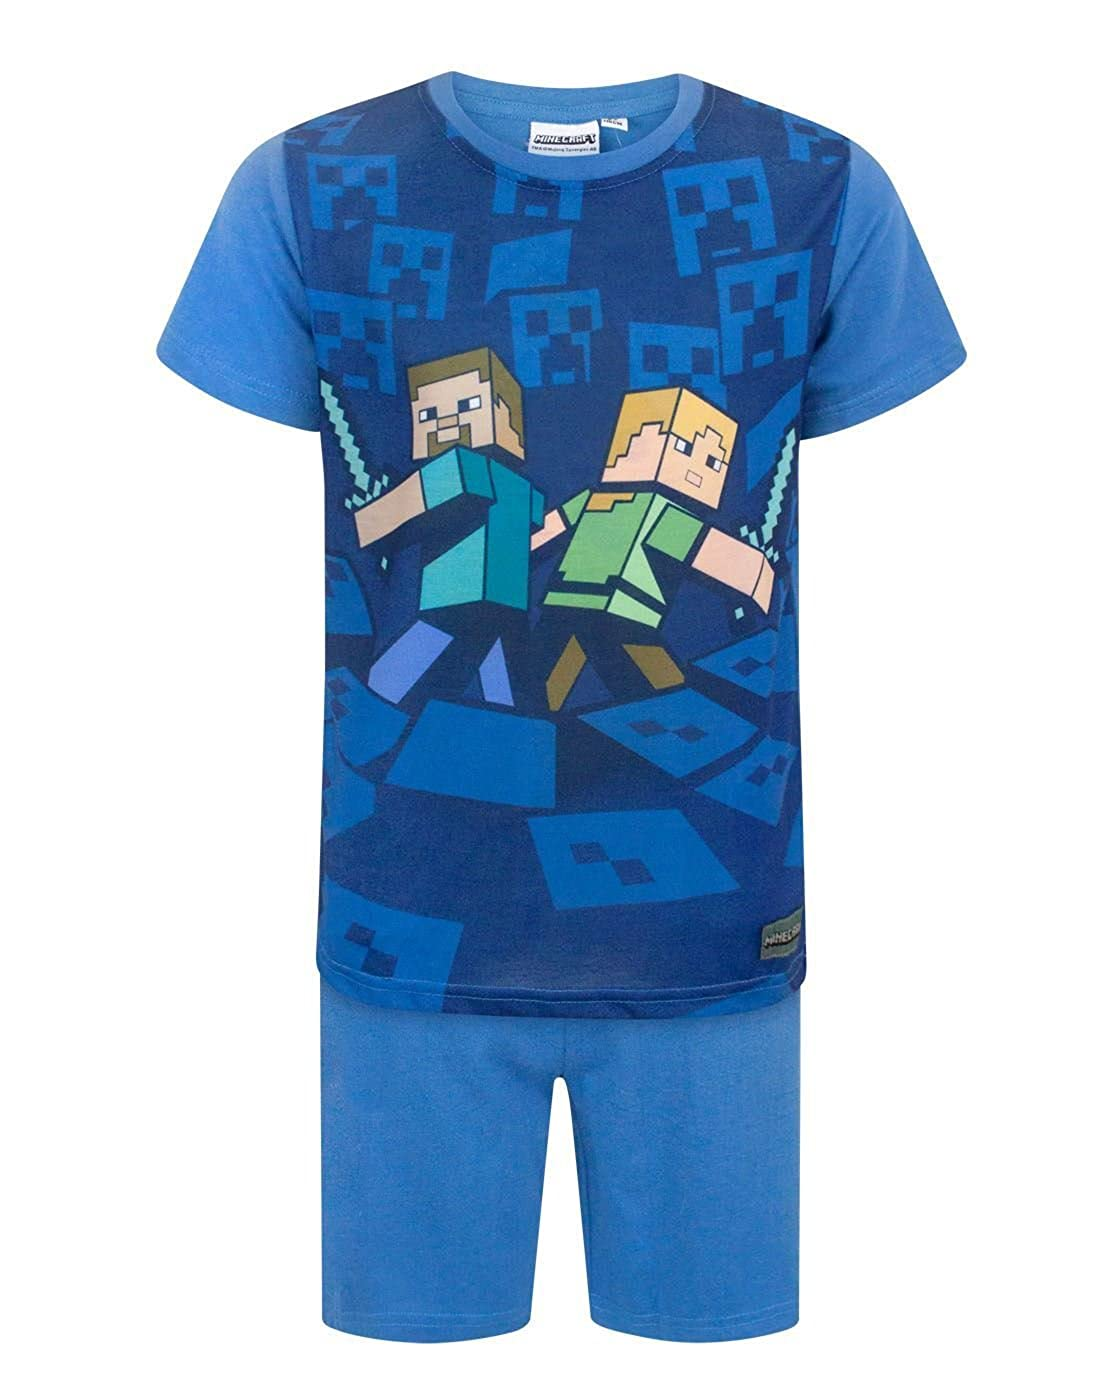 Minecraft Boy's Shortie Pyjamas 6 - 12 Years Various Styles Lamaloli